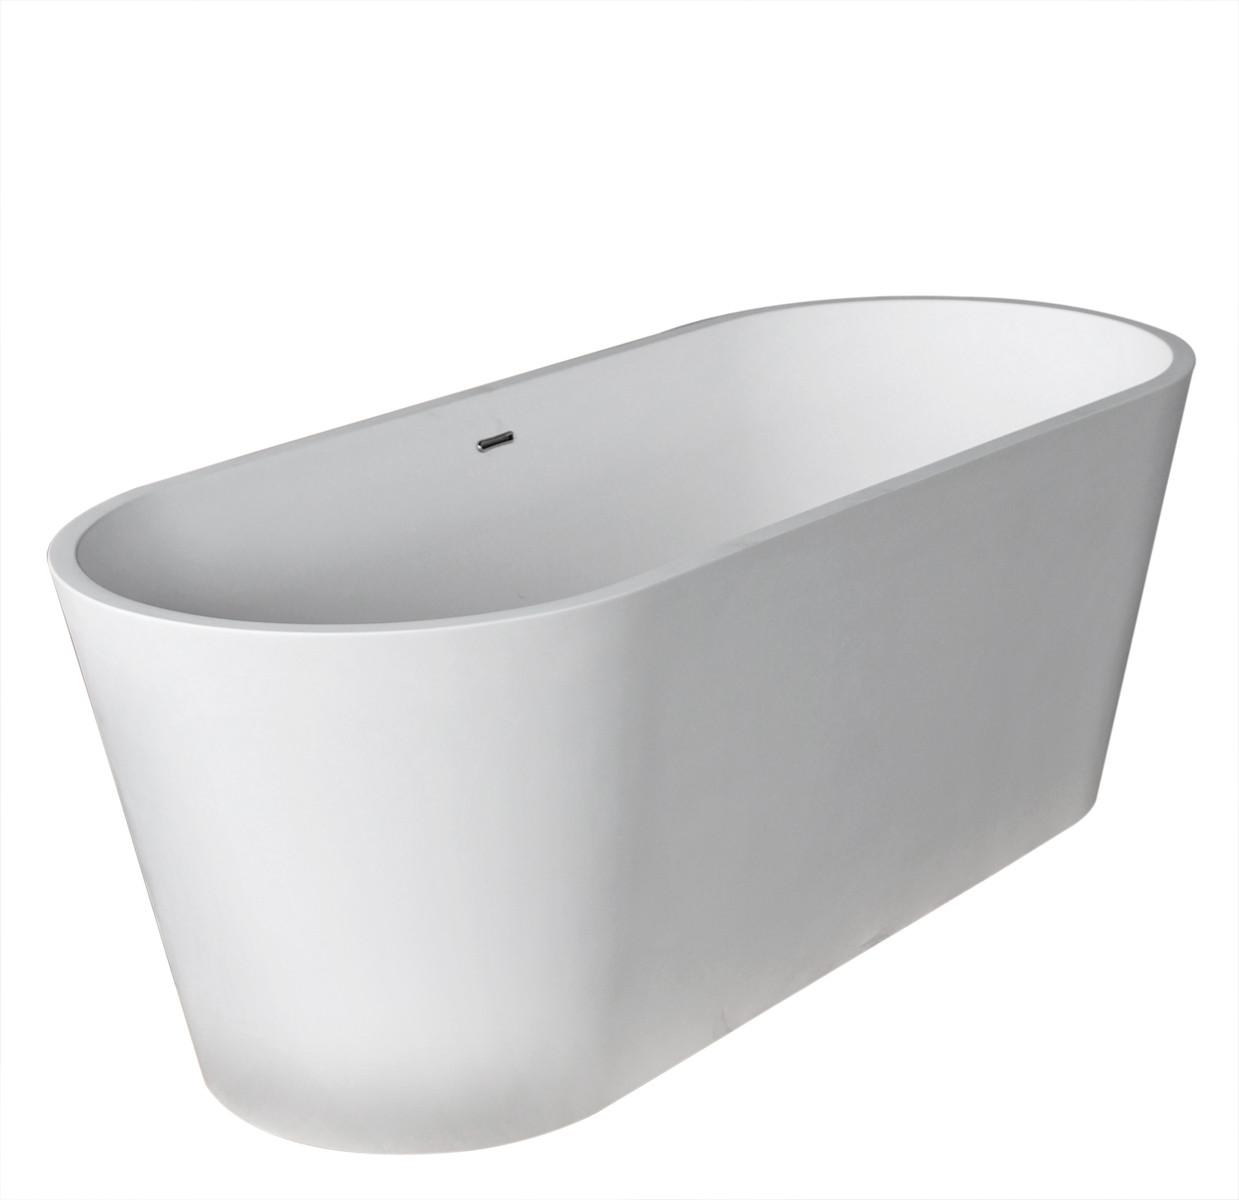 Anzzi FT-AZ503 Rossetto Man-Made Stone Freestanding Bathtub in Matte White